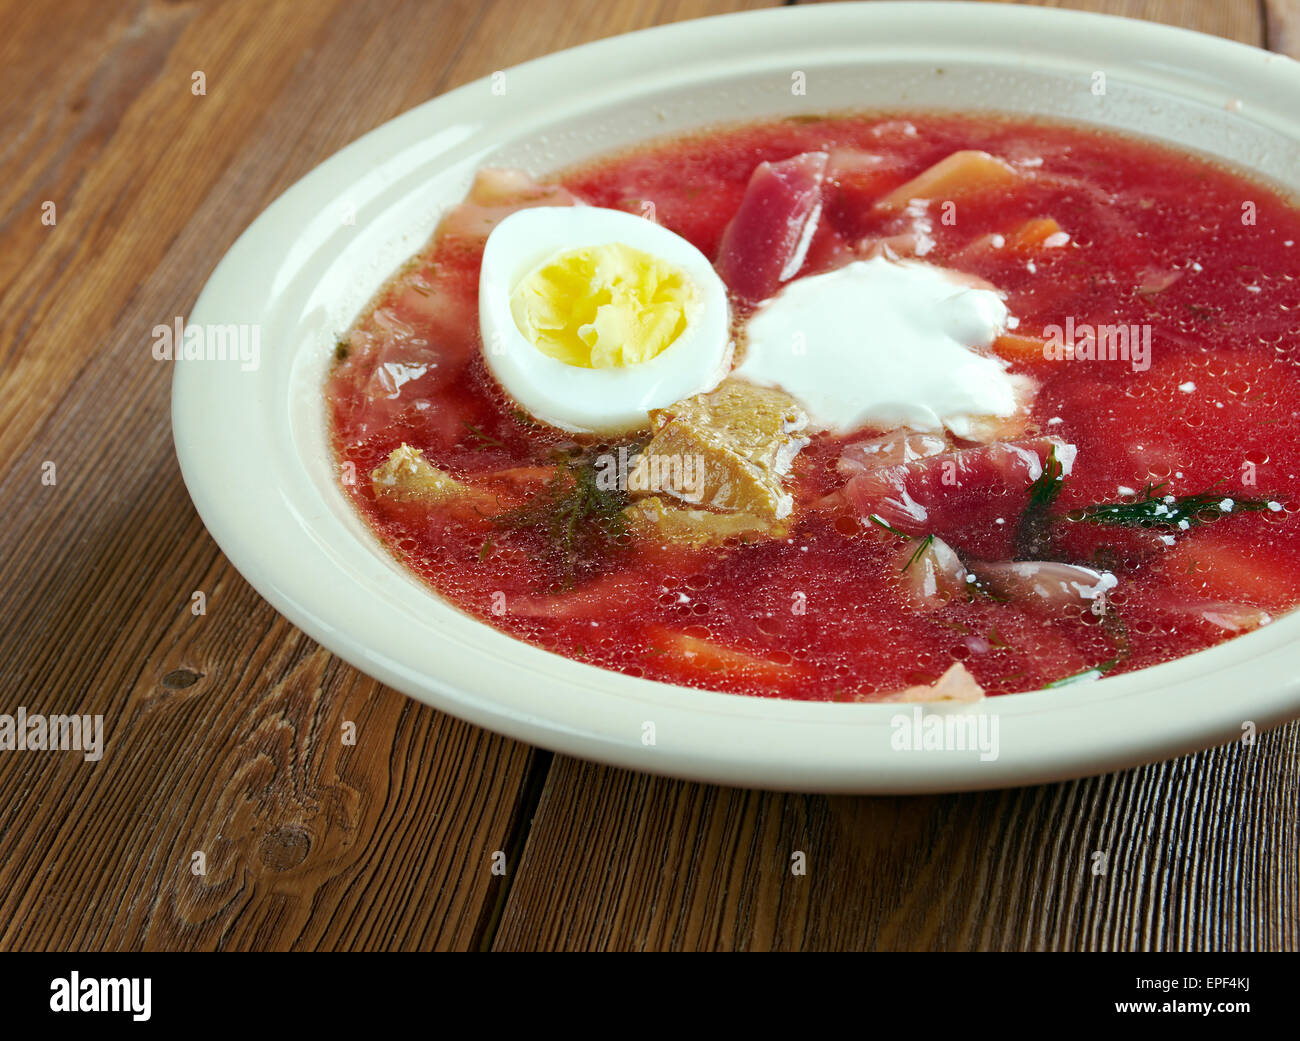 polnische rote bete suppe thermomix